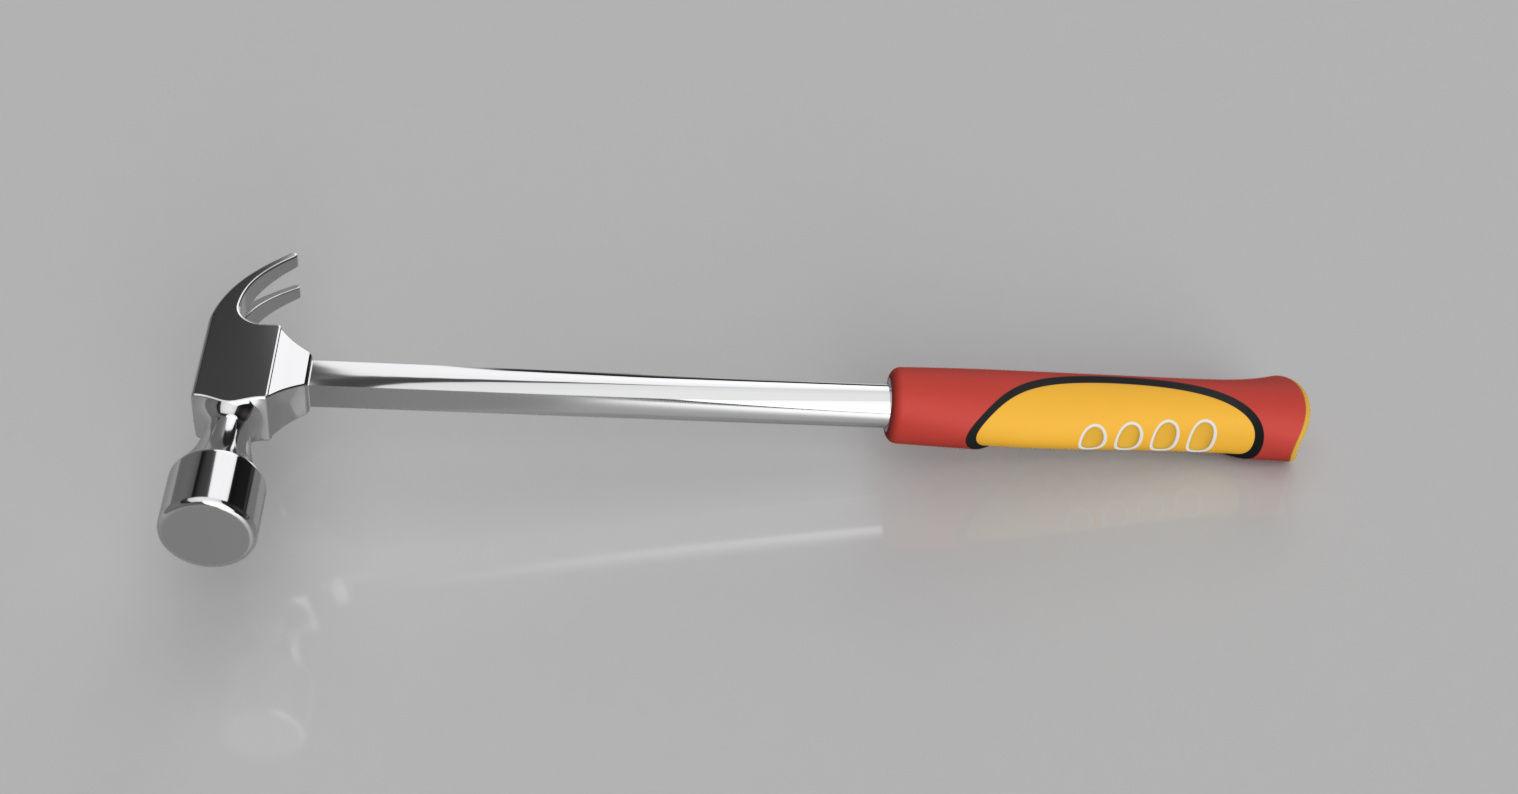 Hammer hand tool autodesk online gallery for Online rendering tool